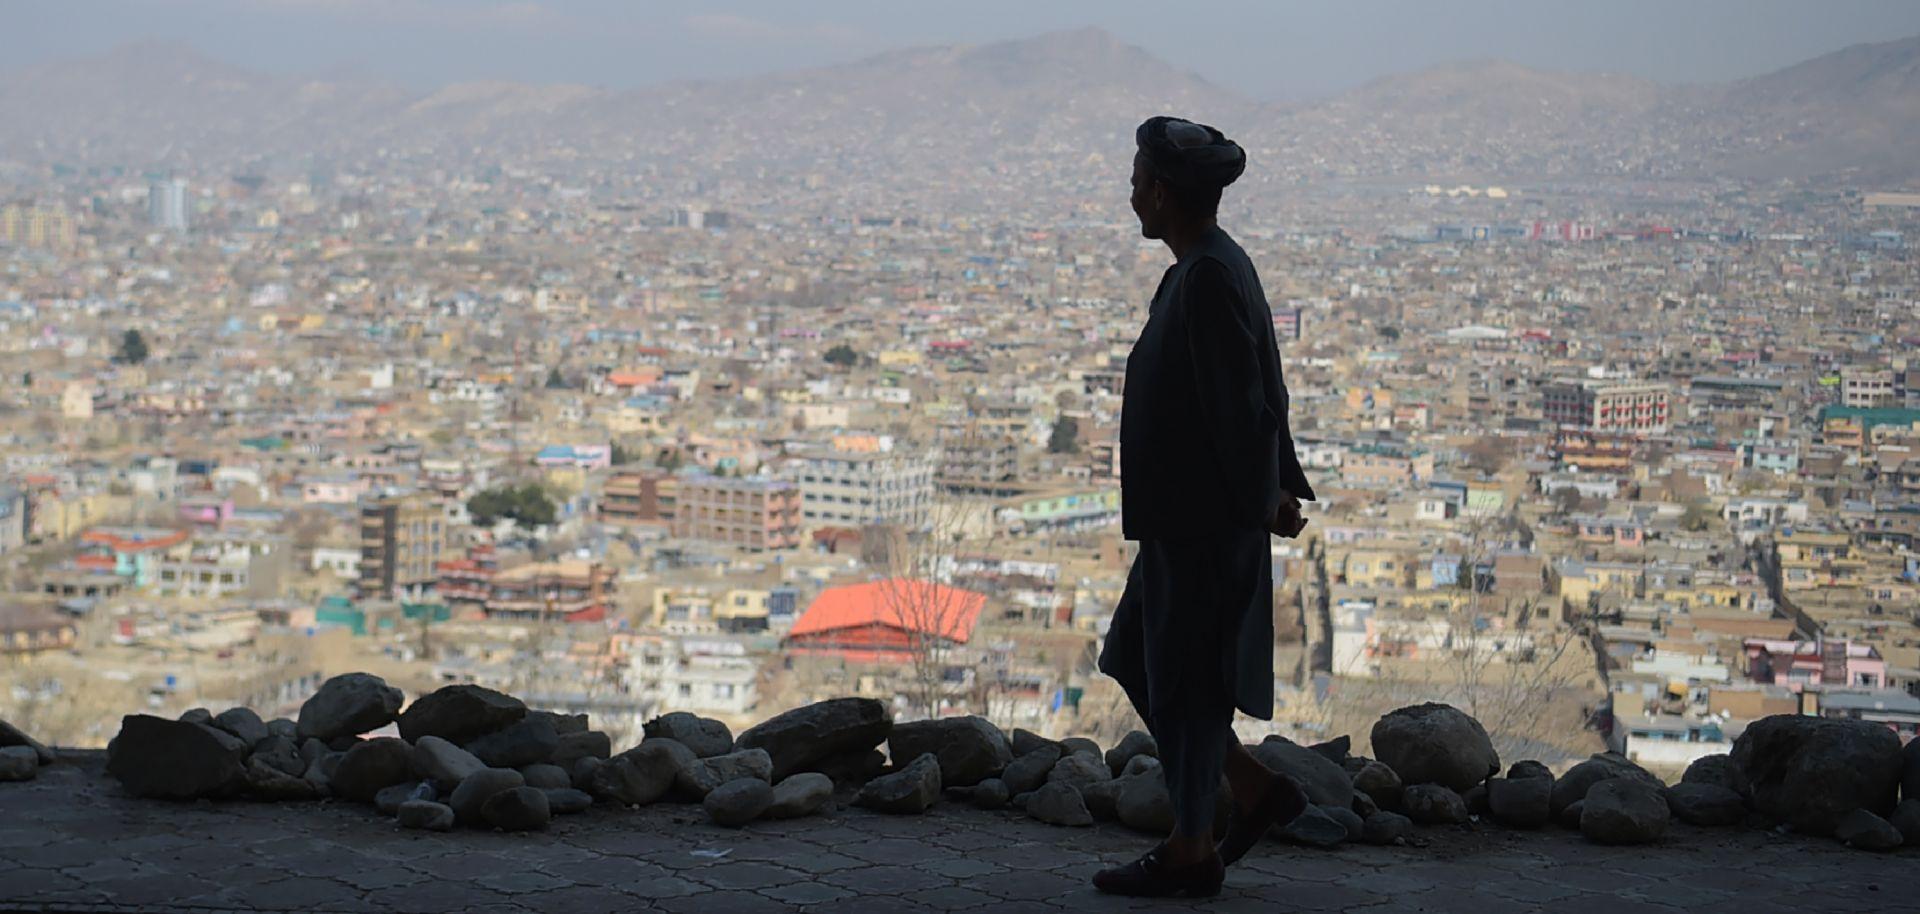 An Afghan man walks along a hilltop overlooking Kabul on March 21, 2018.